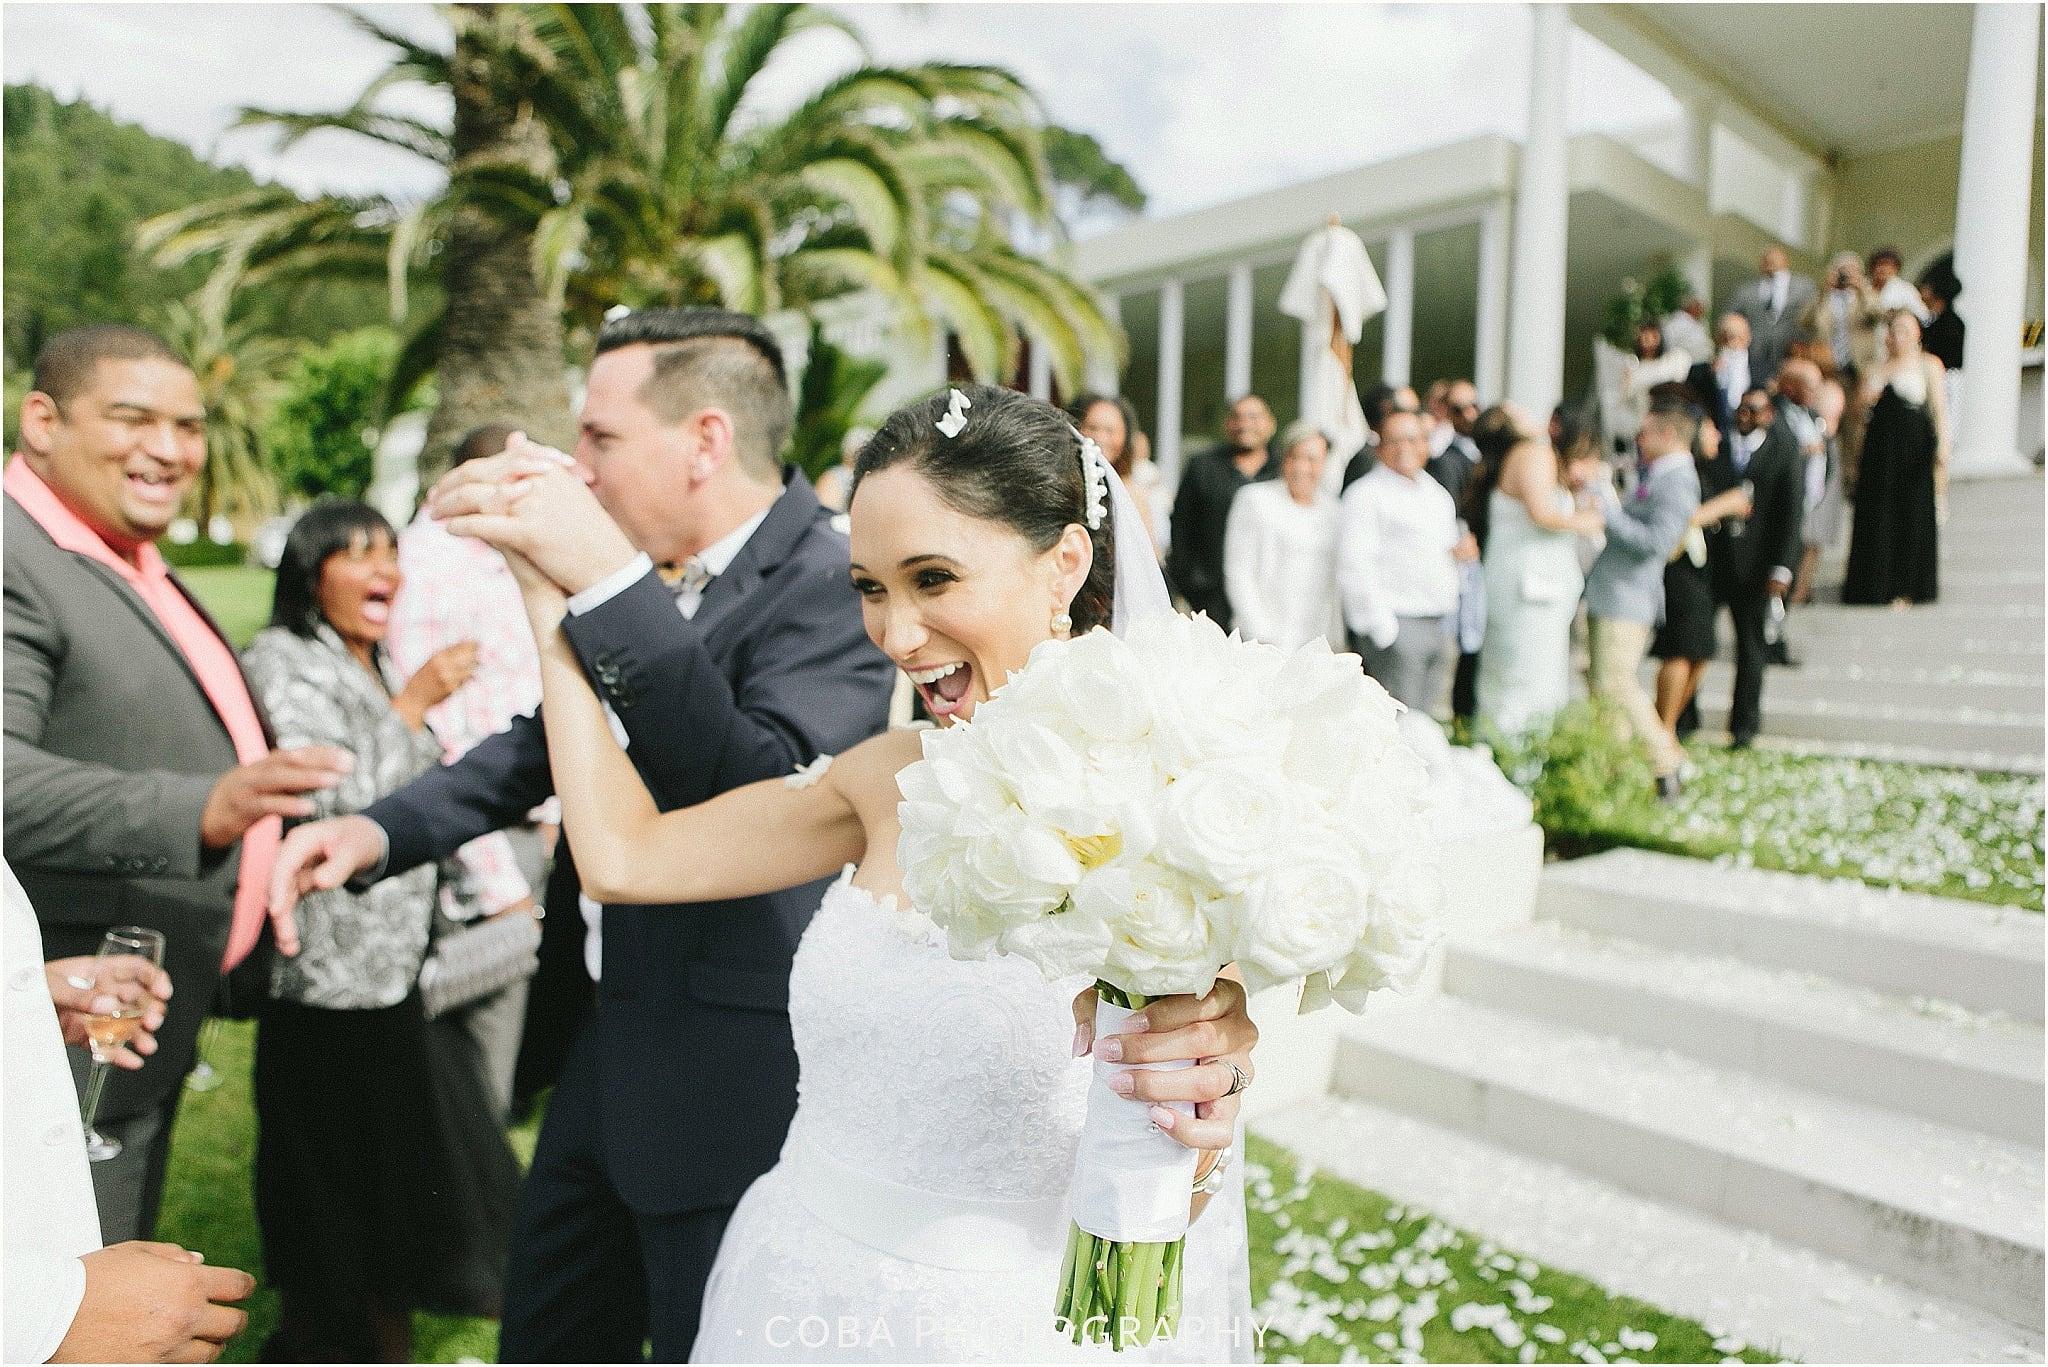 Marc&Melissa - Cascade Manor - Coba Photography (137)